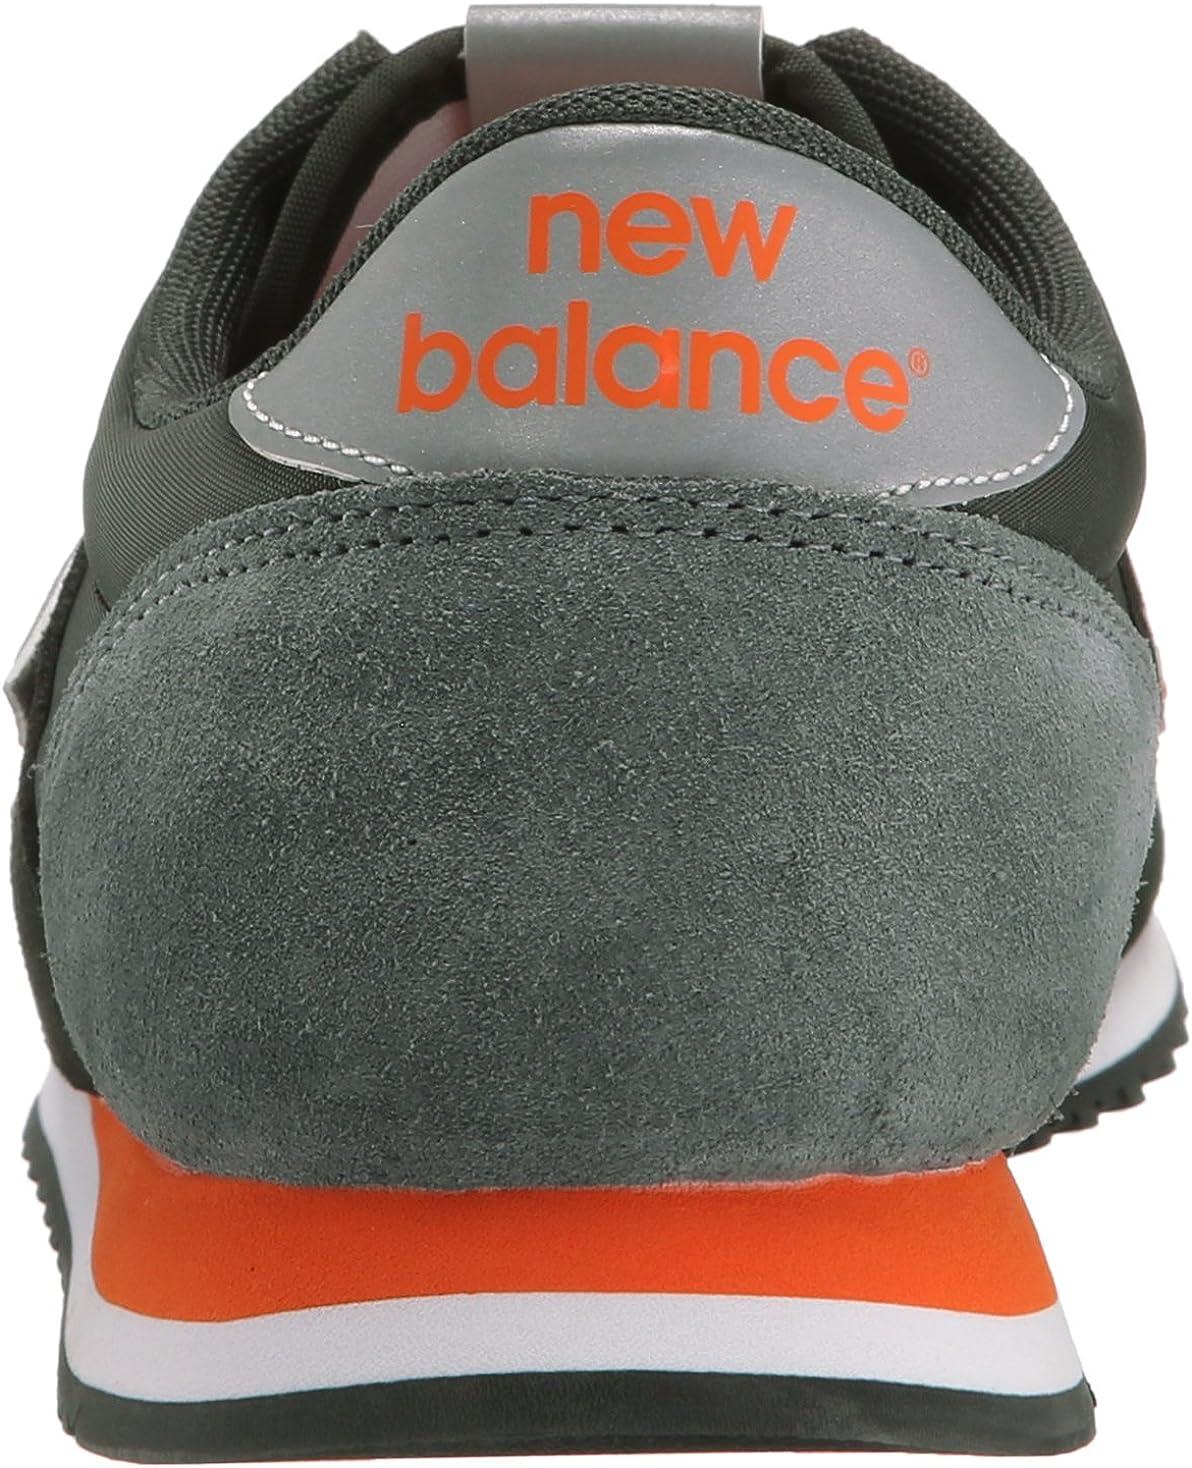 Amazon.com: New Balance U420 Classic Zapatillas de running: Shoes